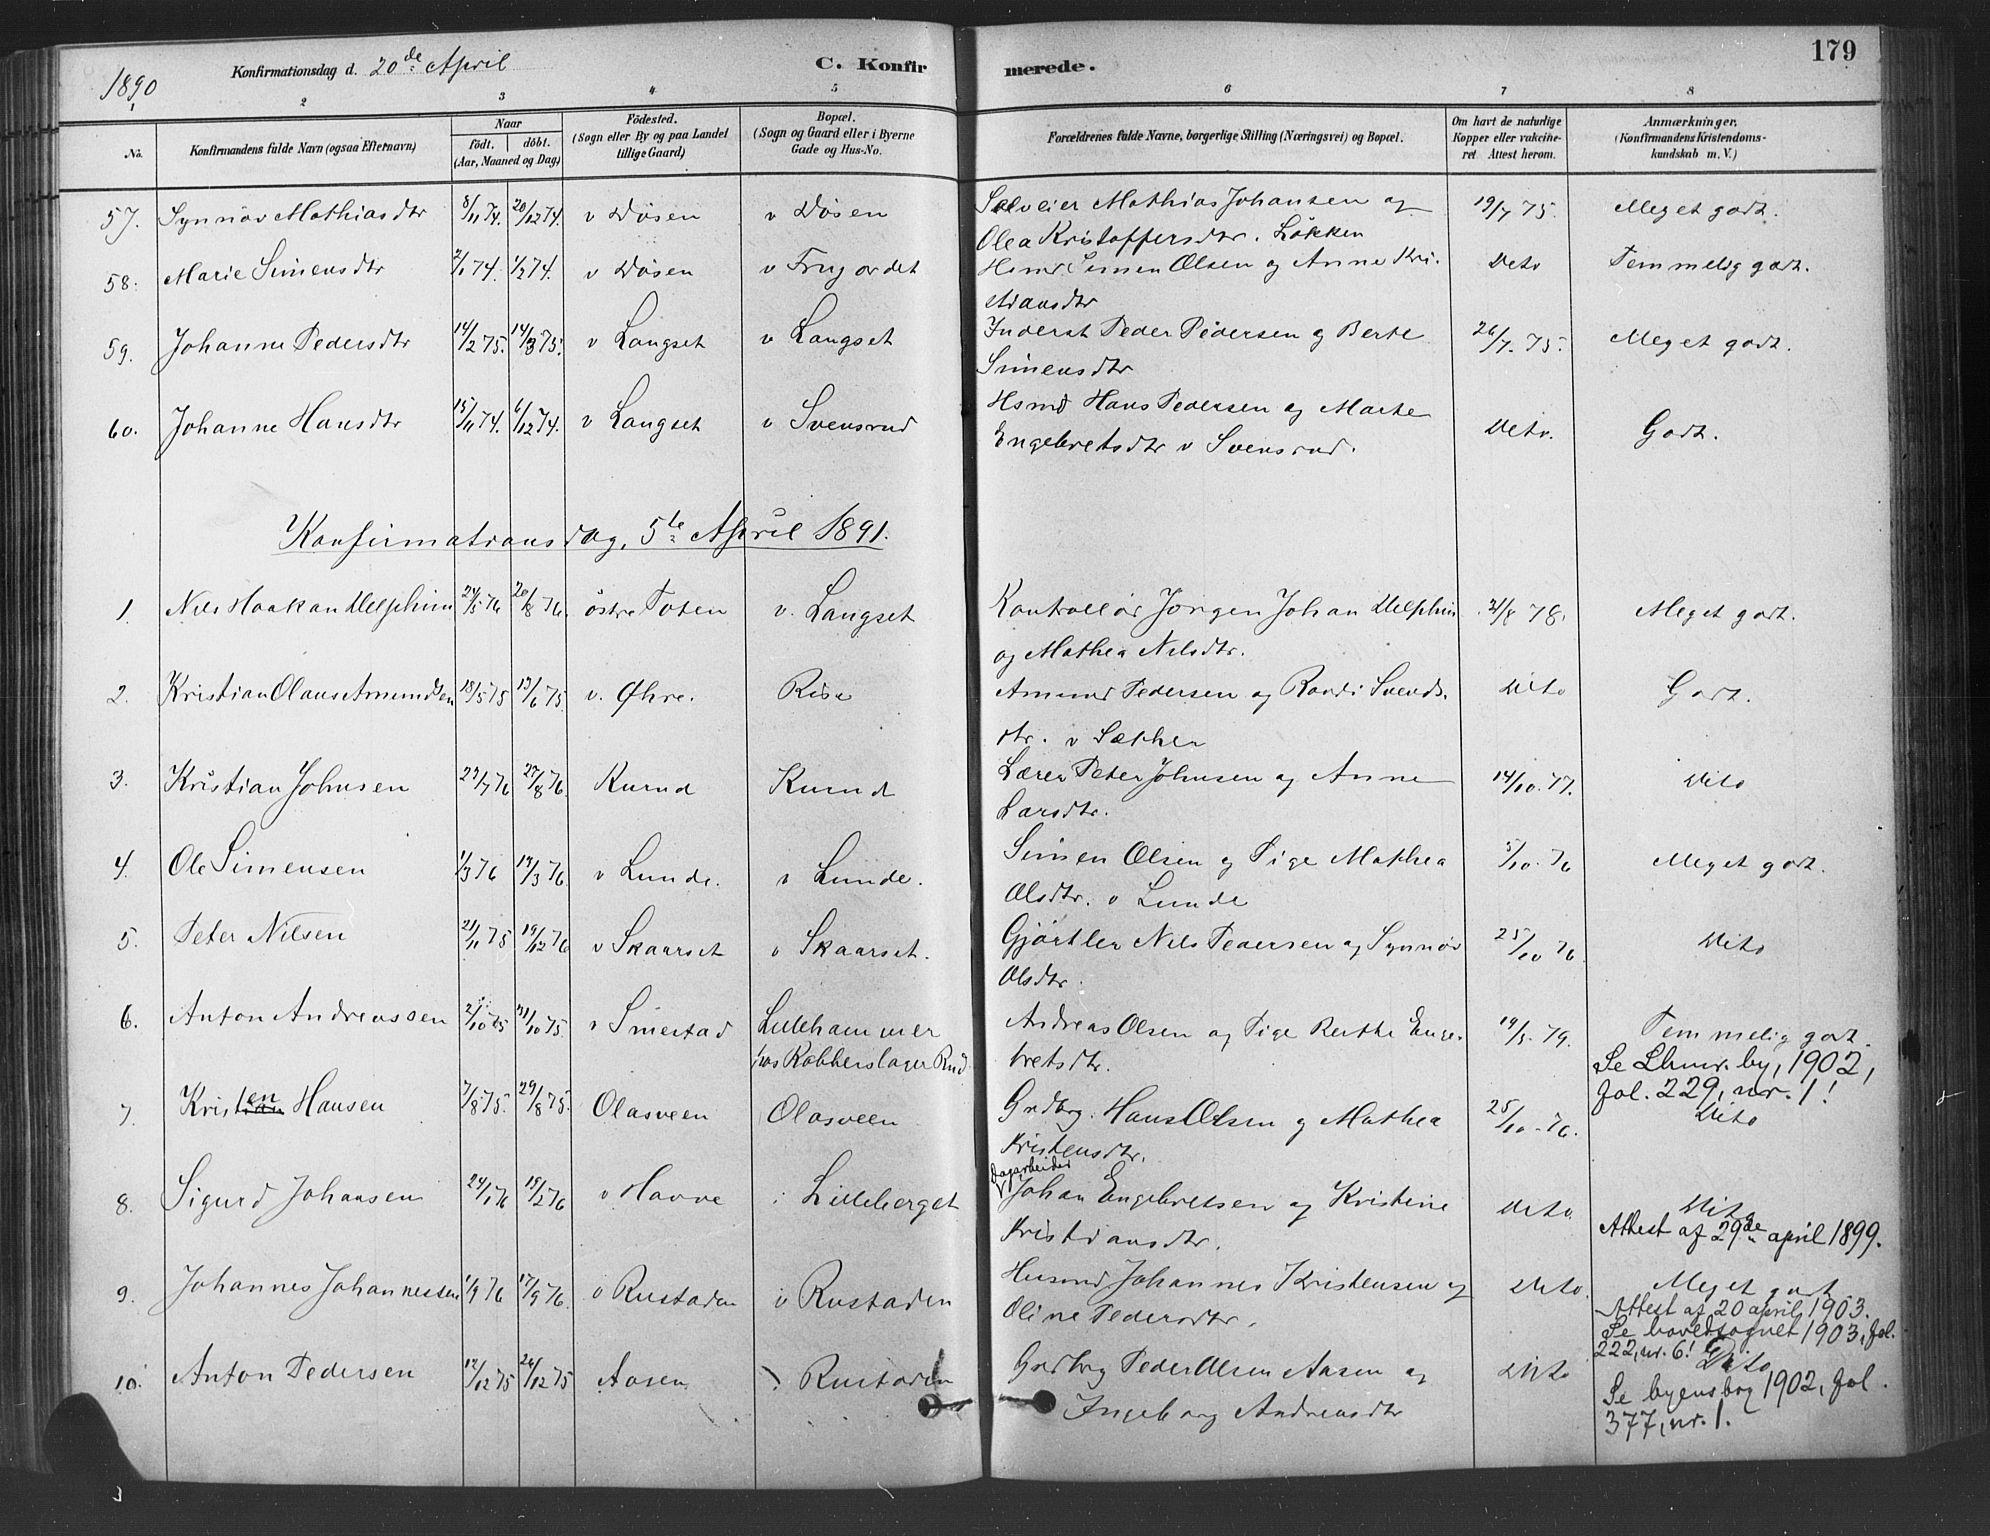 SAH, Fåberg prestekontor, Ministerialbok nr. 9, 1879-1898, s. 179